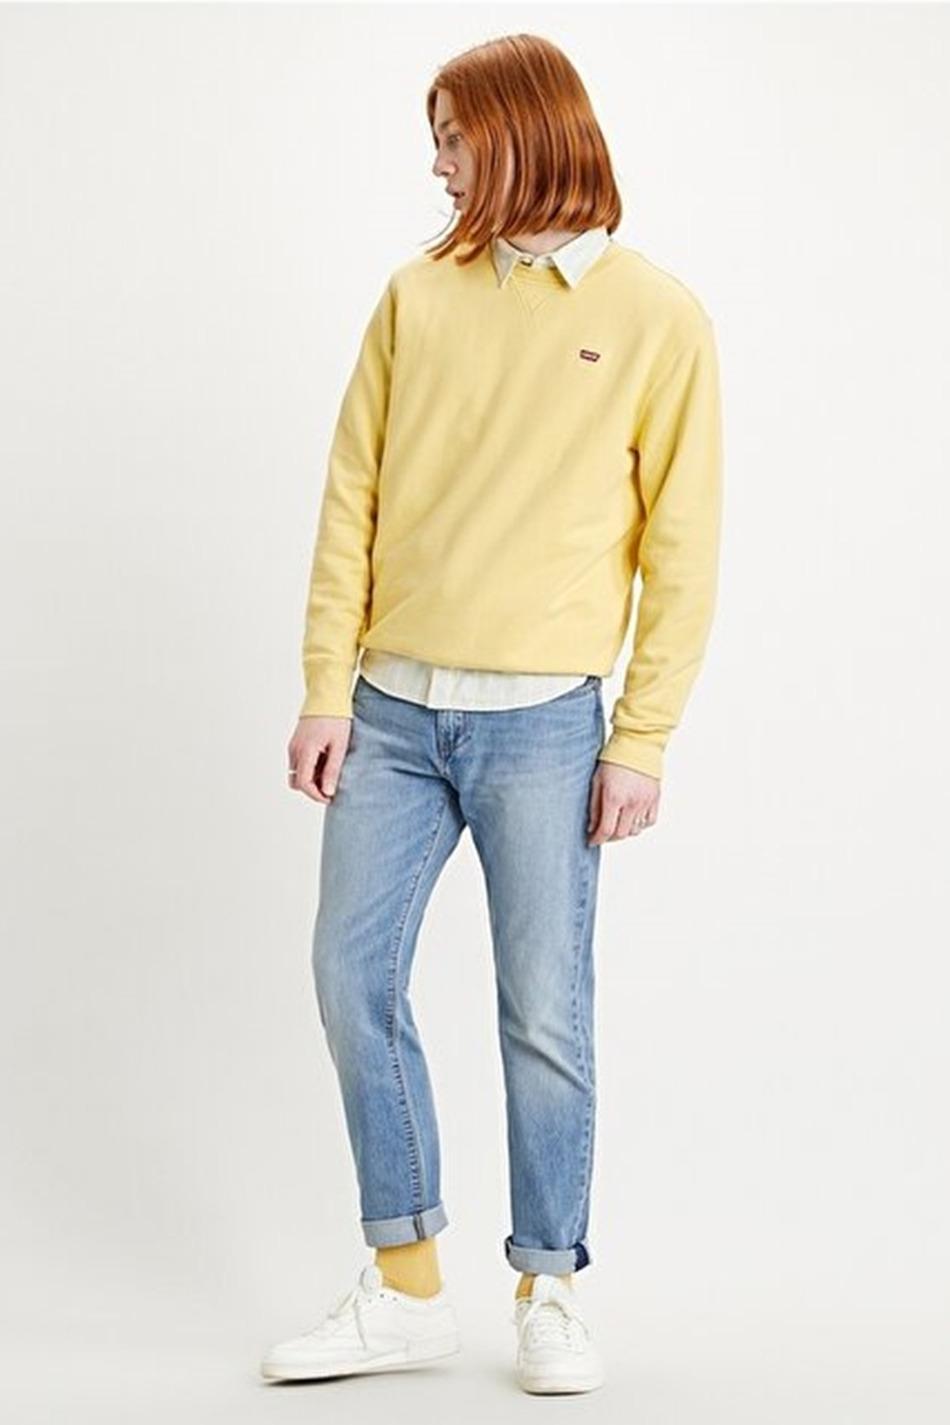 Levi's New Original Yellow Sweatshirt